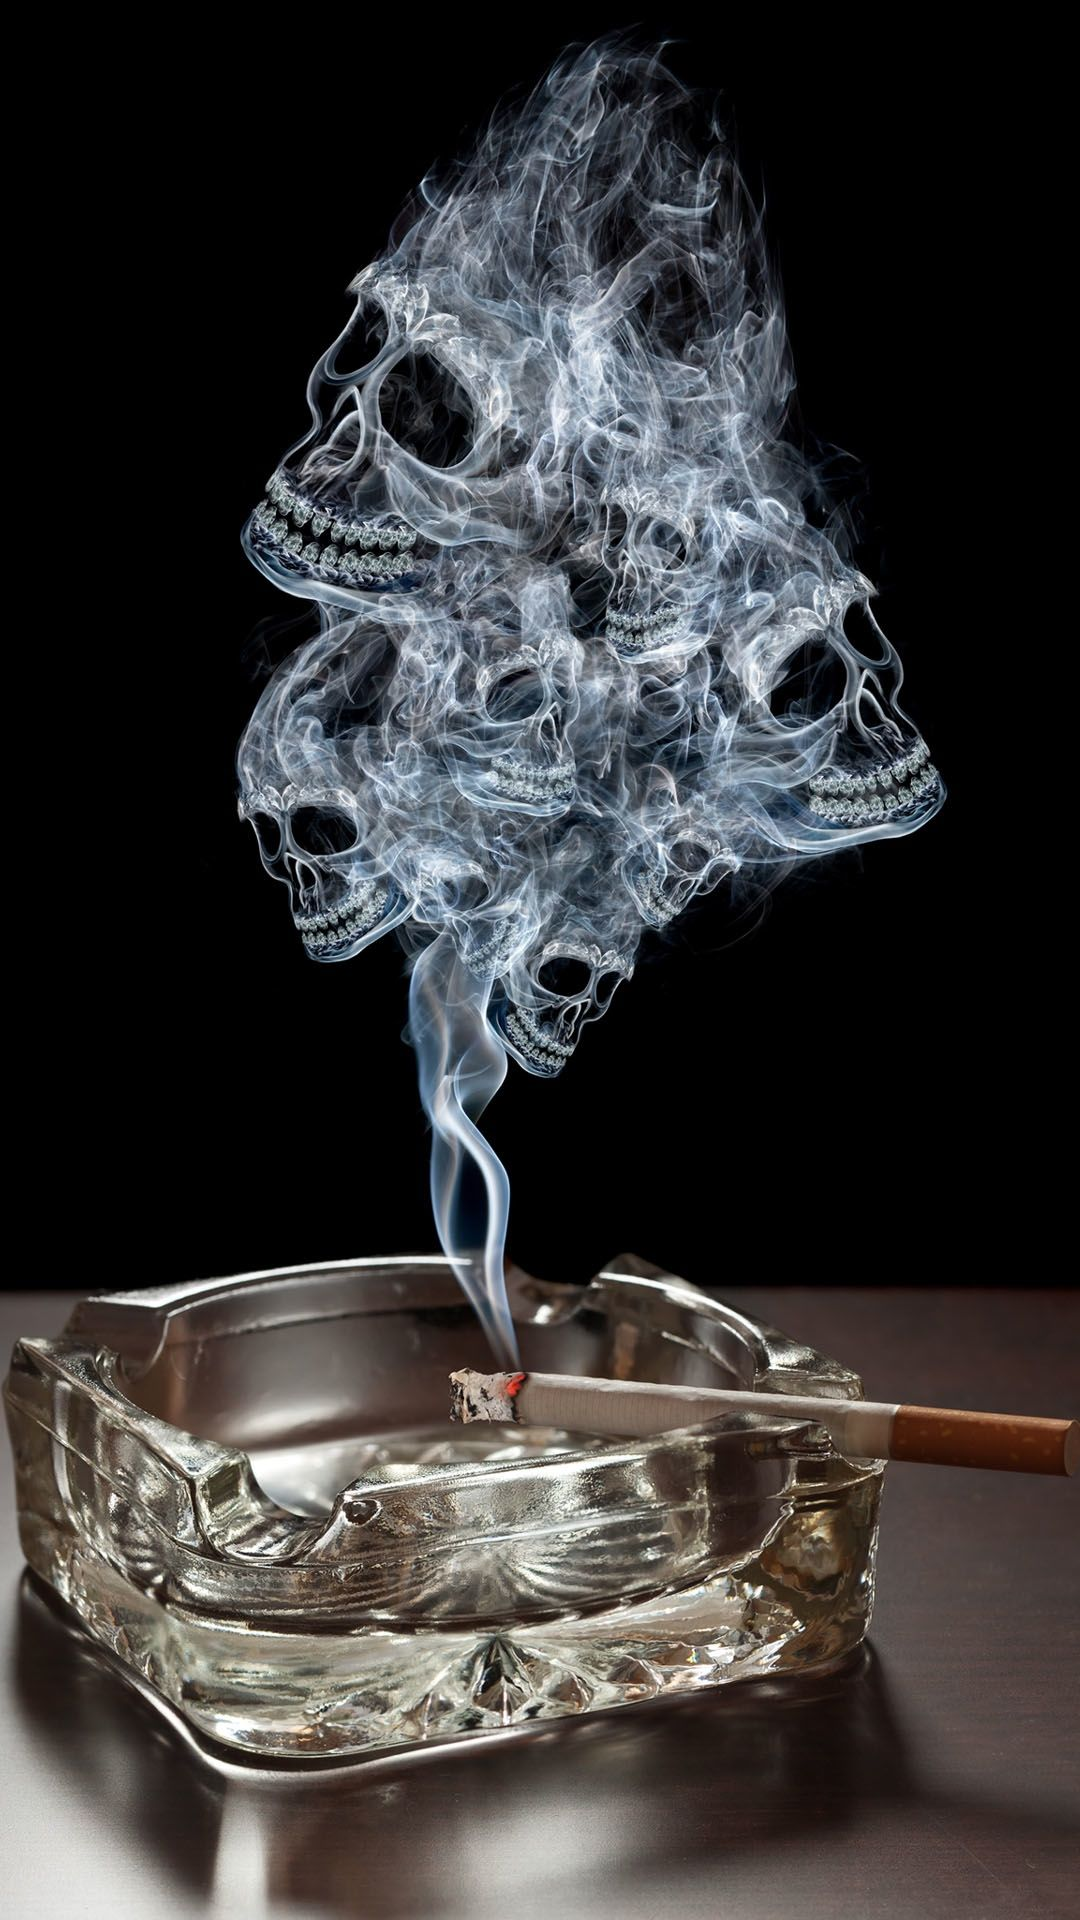 Smoke Skulls Ashtray Burning Cigarette iPhone 6 Plus HD